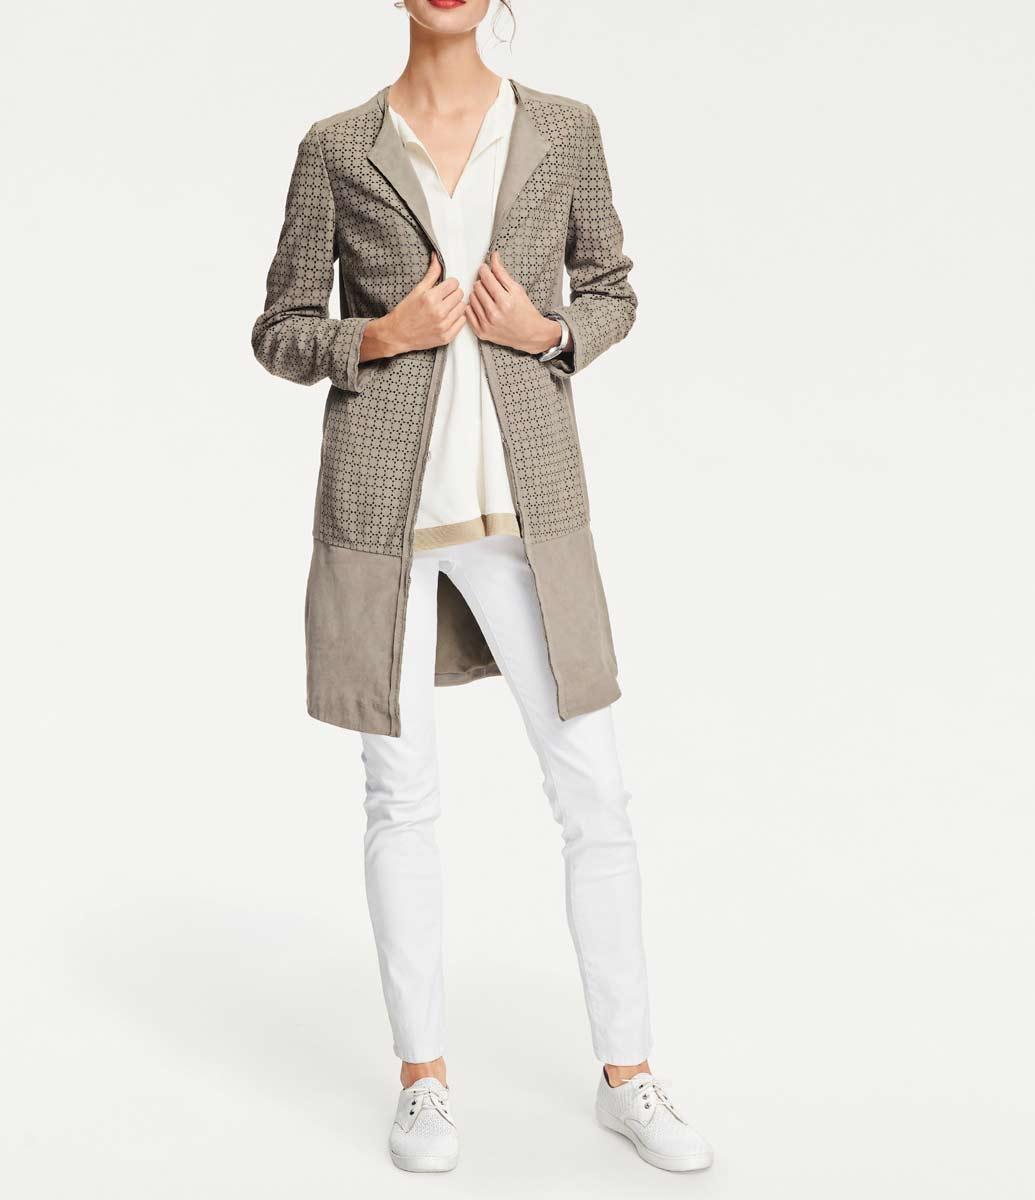 Damenmäntel Frühjahr 2021 RICK CARDONA Damen Designer-Ziegenledermantel Sand Mantel Echtleder 072.326 Missforty